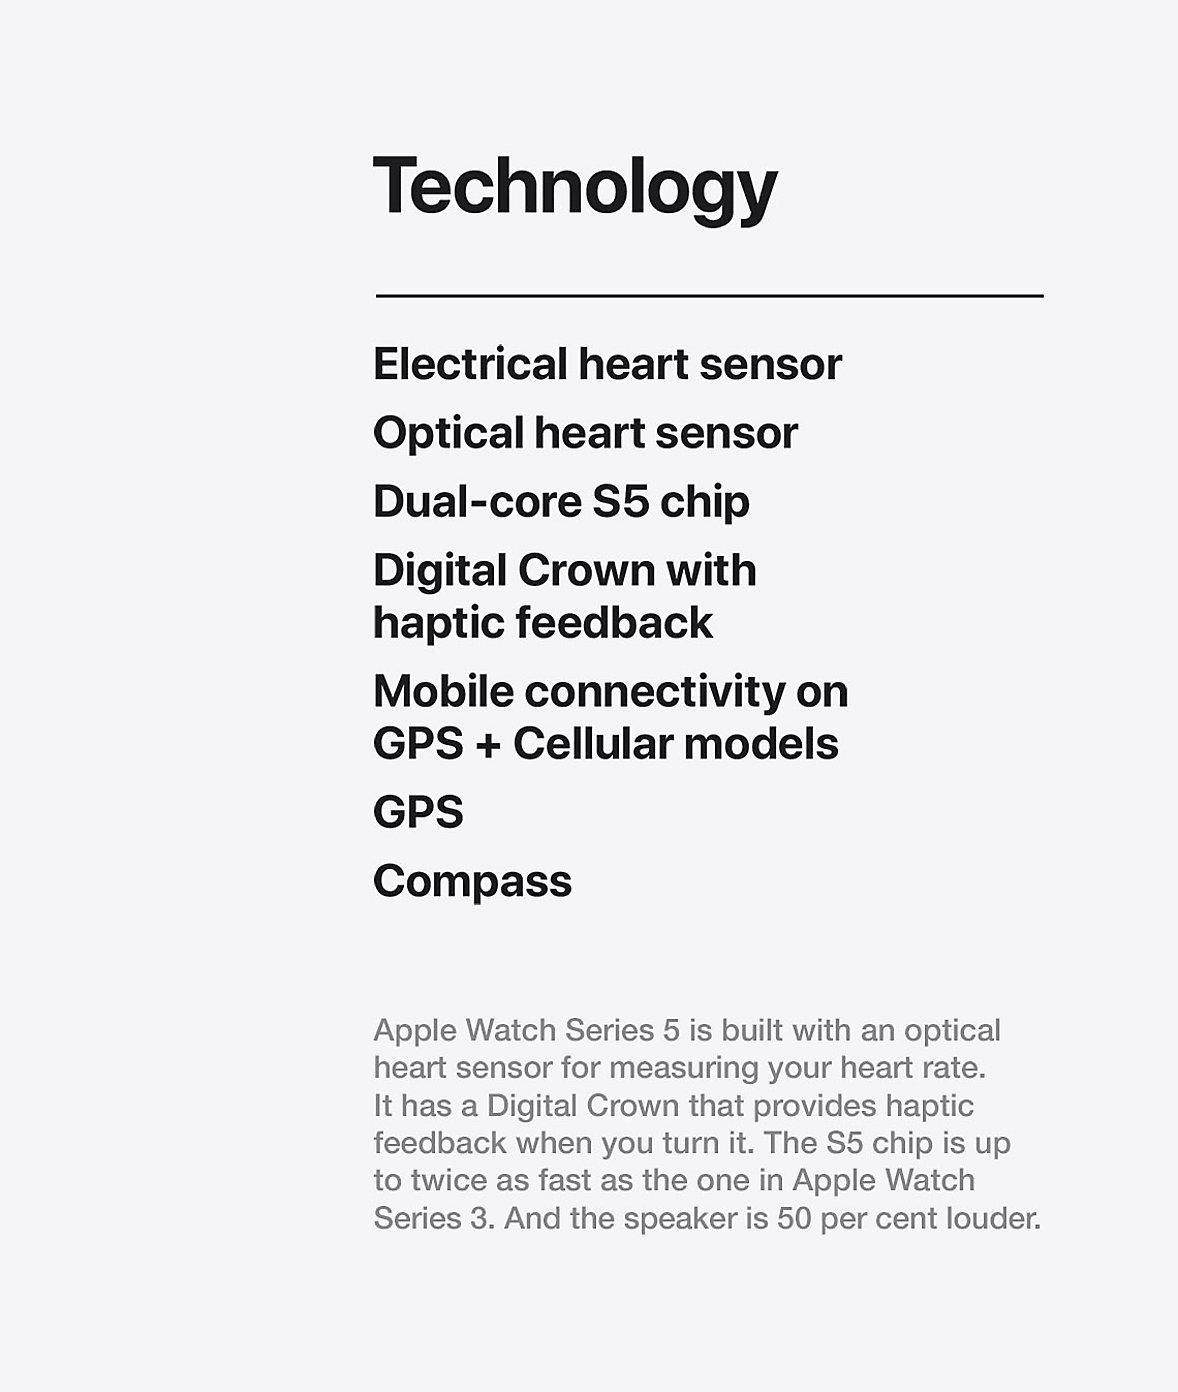 Apple Watch Technology Series 5